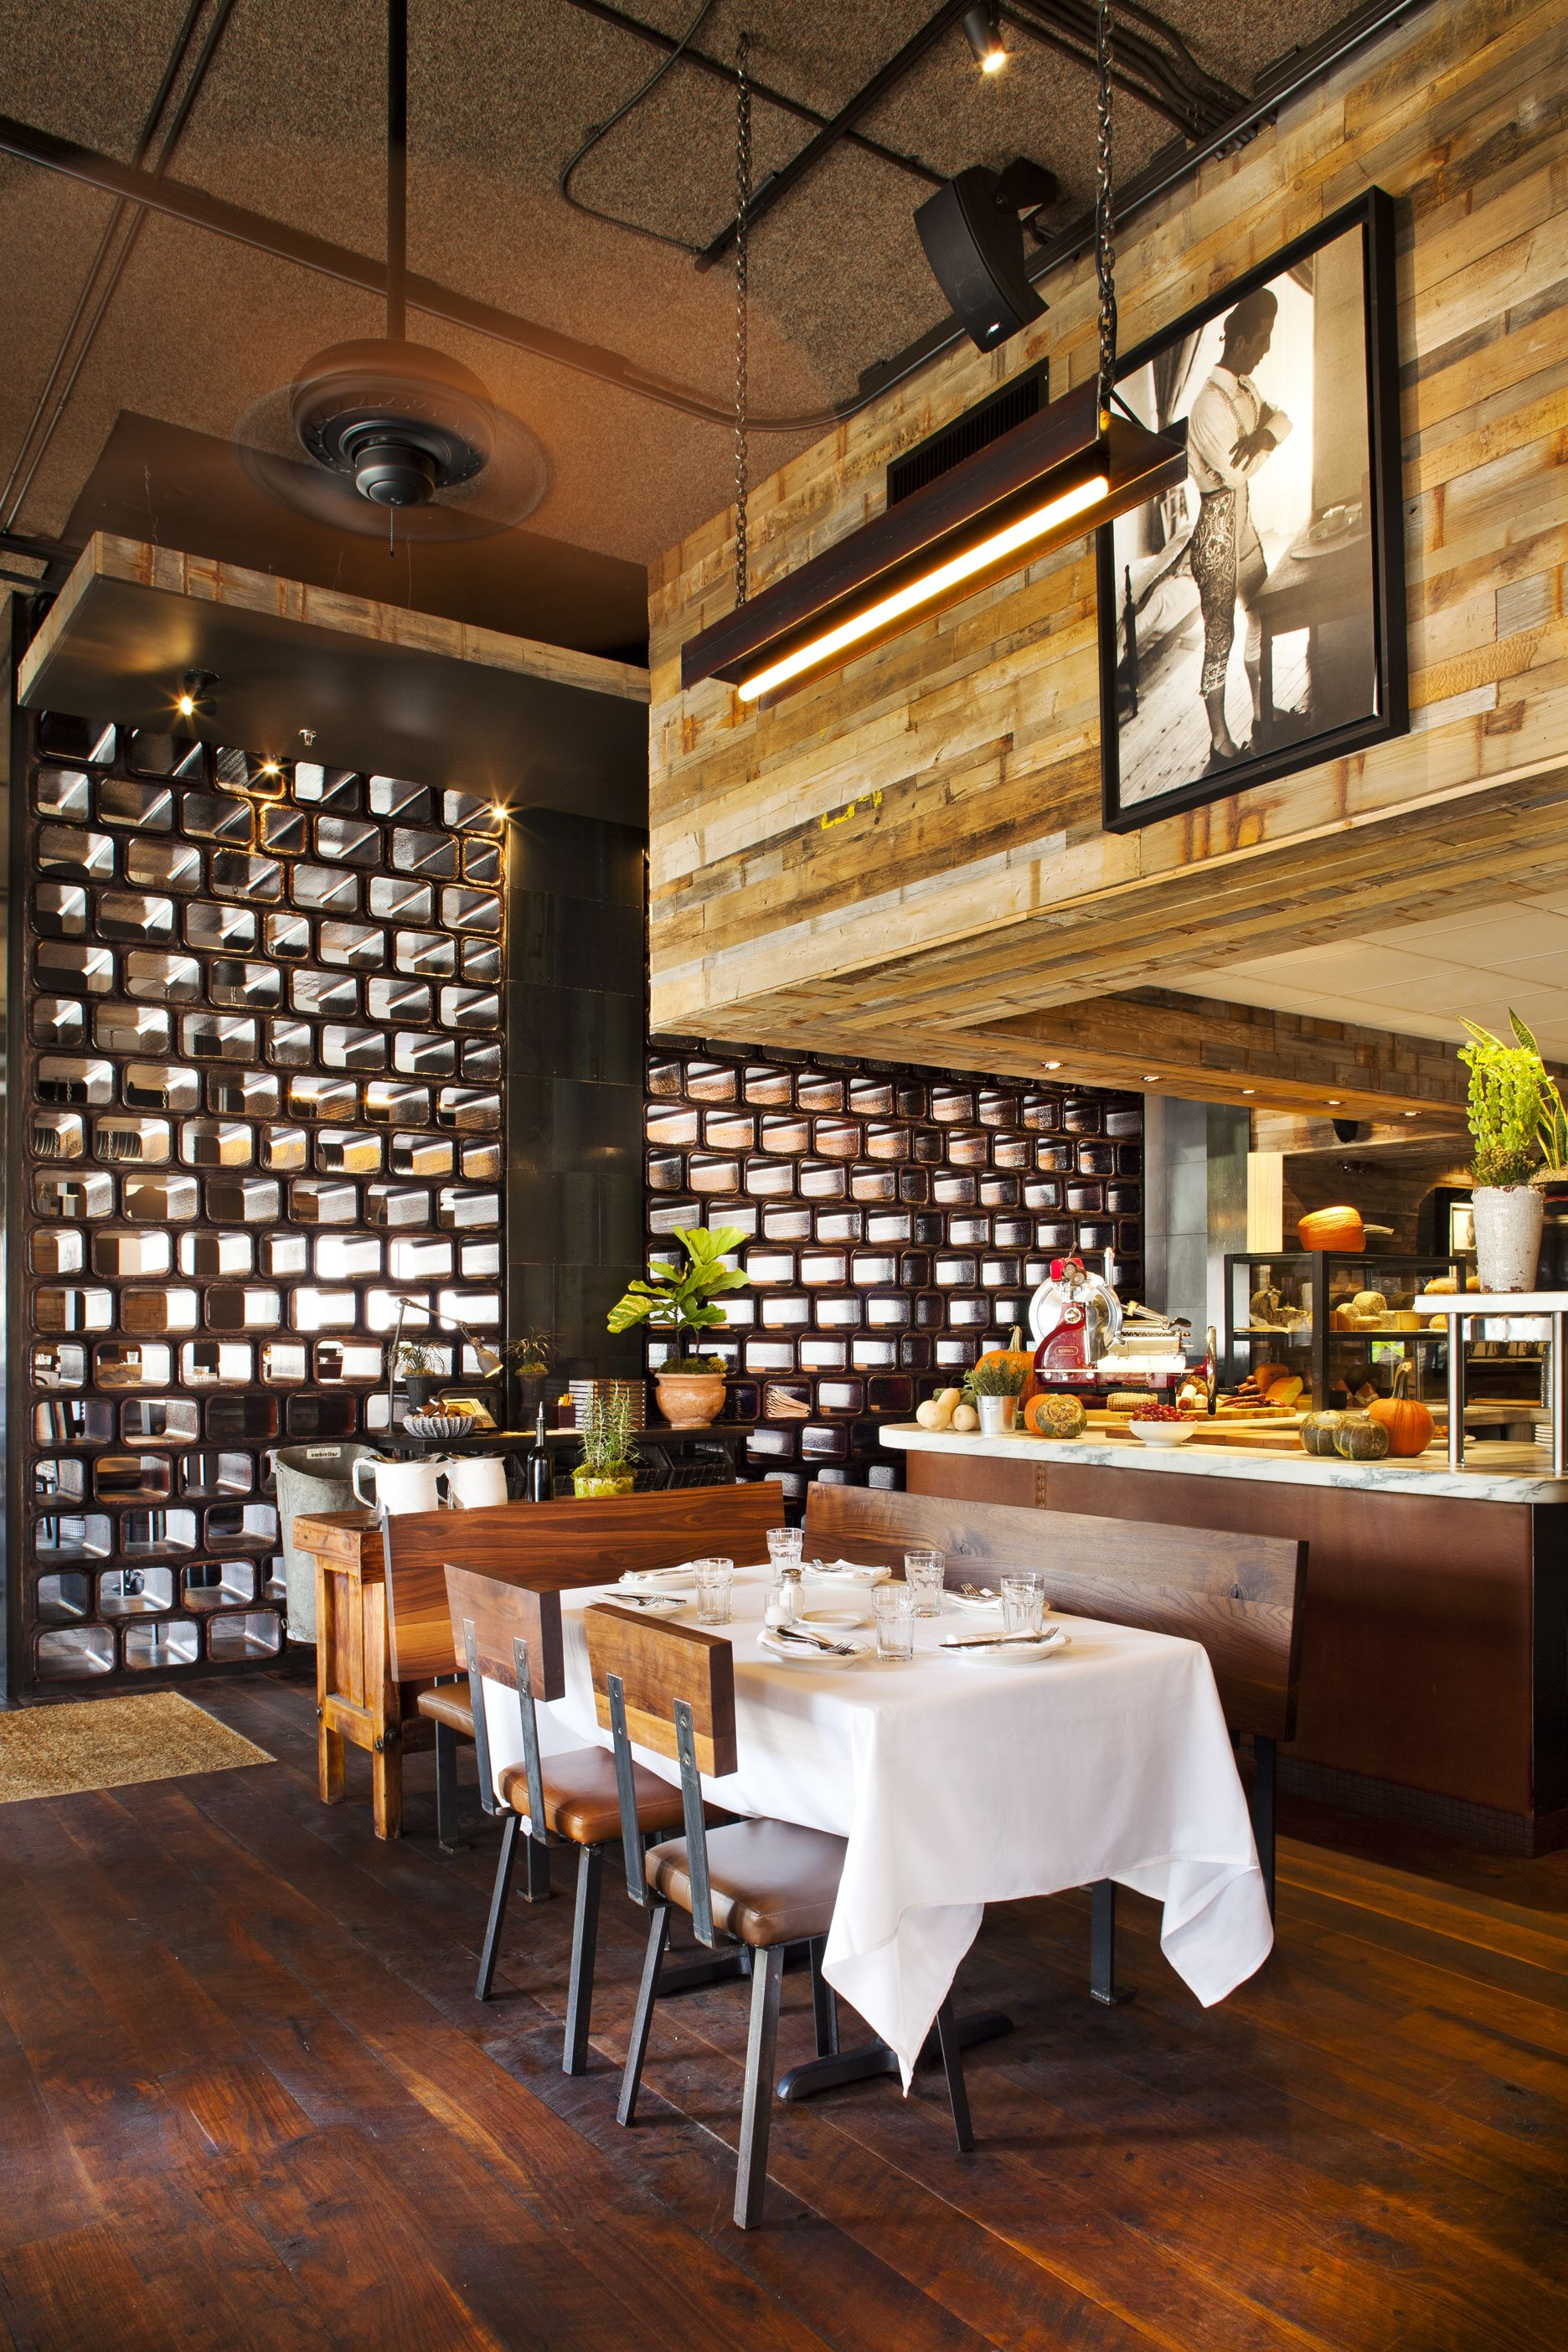 Barcelona Atlanta Wine Bar Restaurant Barcelona Wine Bar Wine Bar Restaurant Restaurant Design